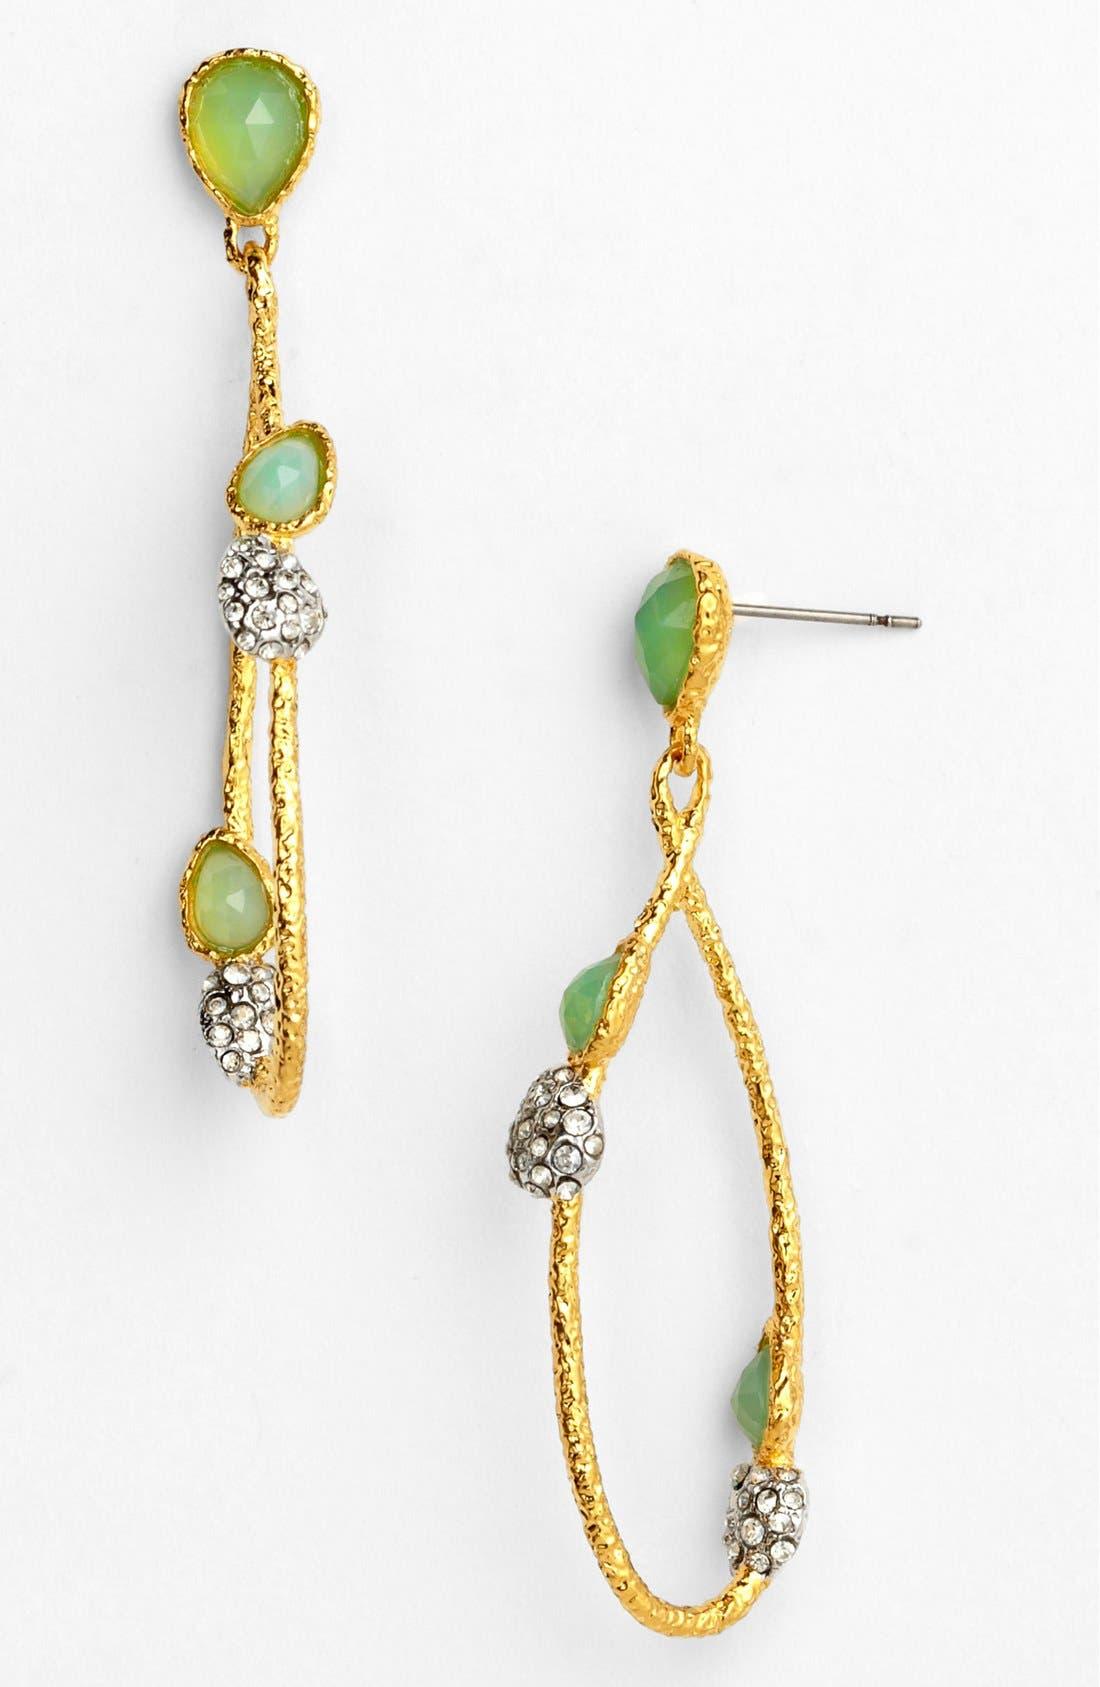 Main Image - Alexis Bittar 'Elements - Floral' Vine Teardrop Earrings (Nordstrom Exclusive)